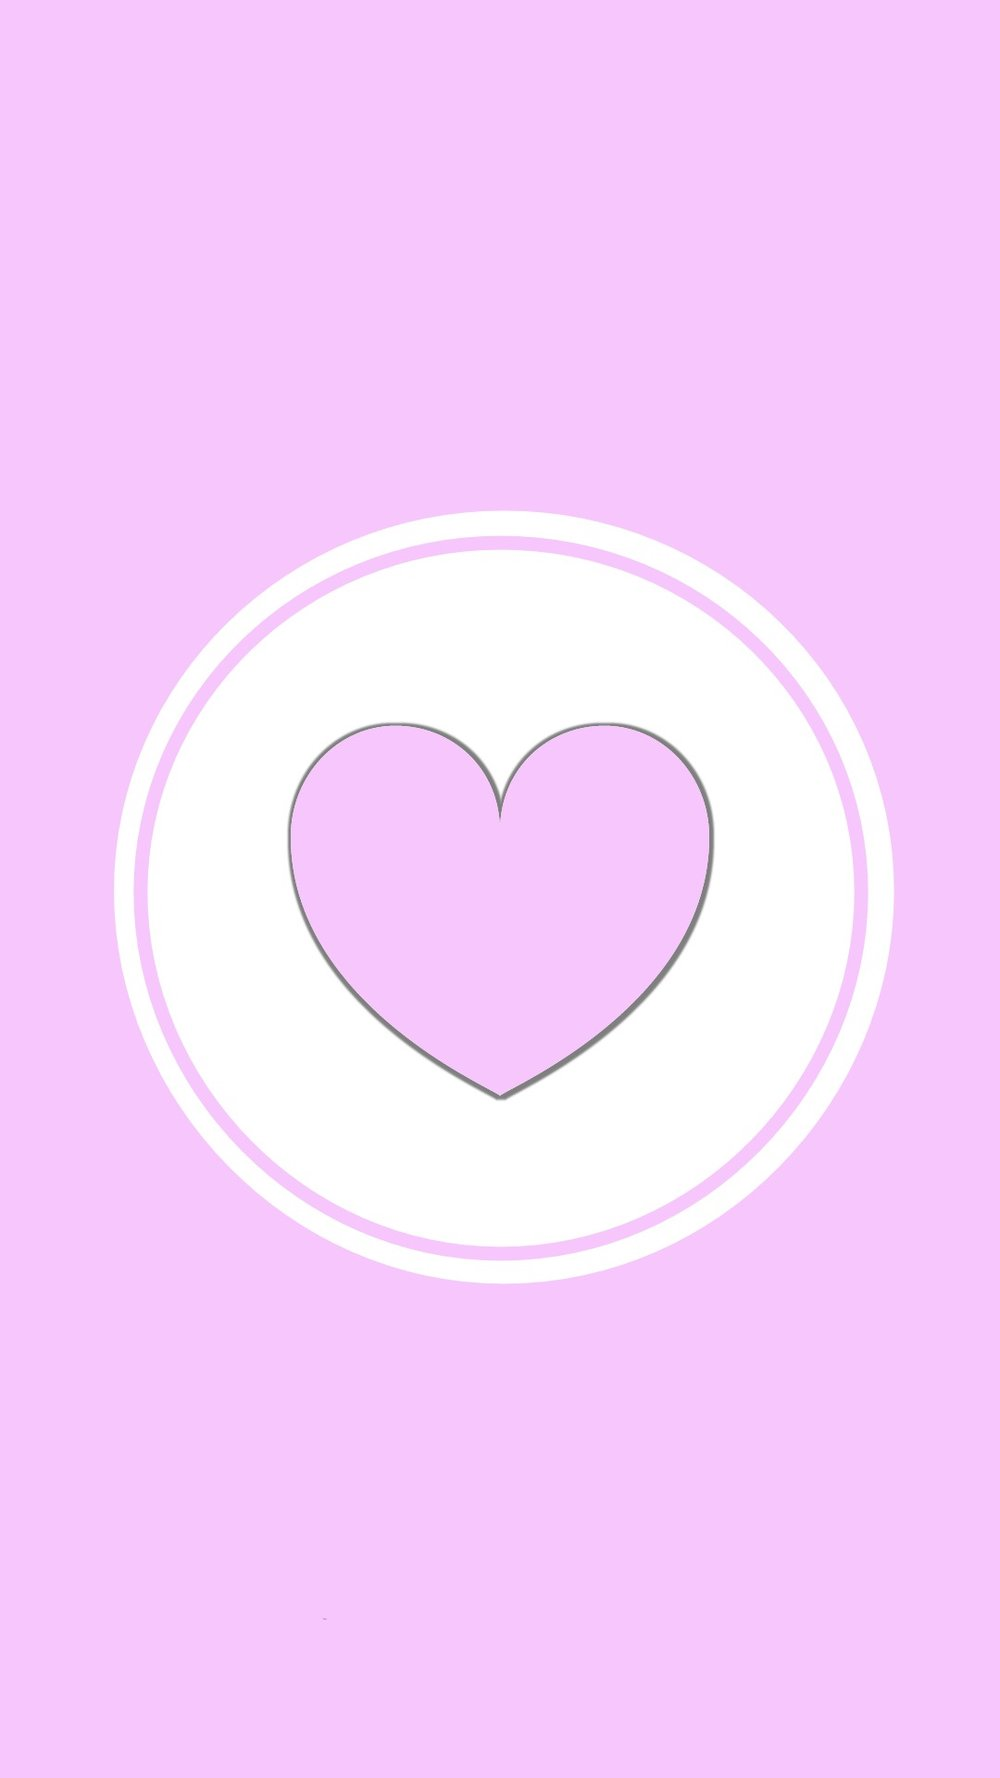 Instagram-cover-heart-pink-lotnotes.com.jpg